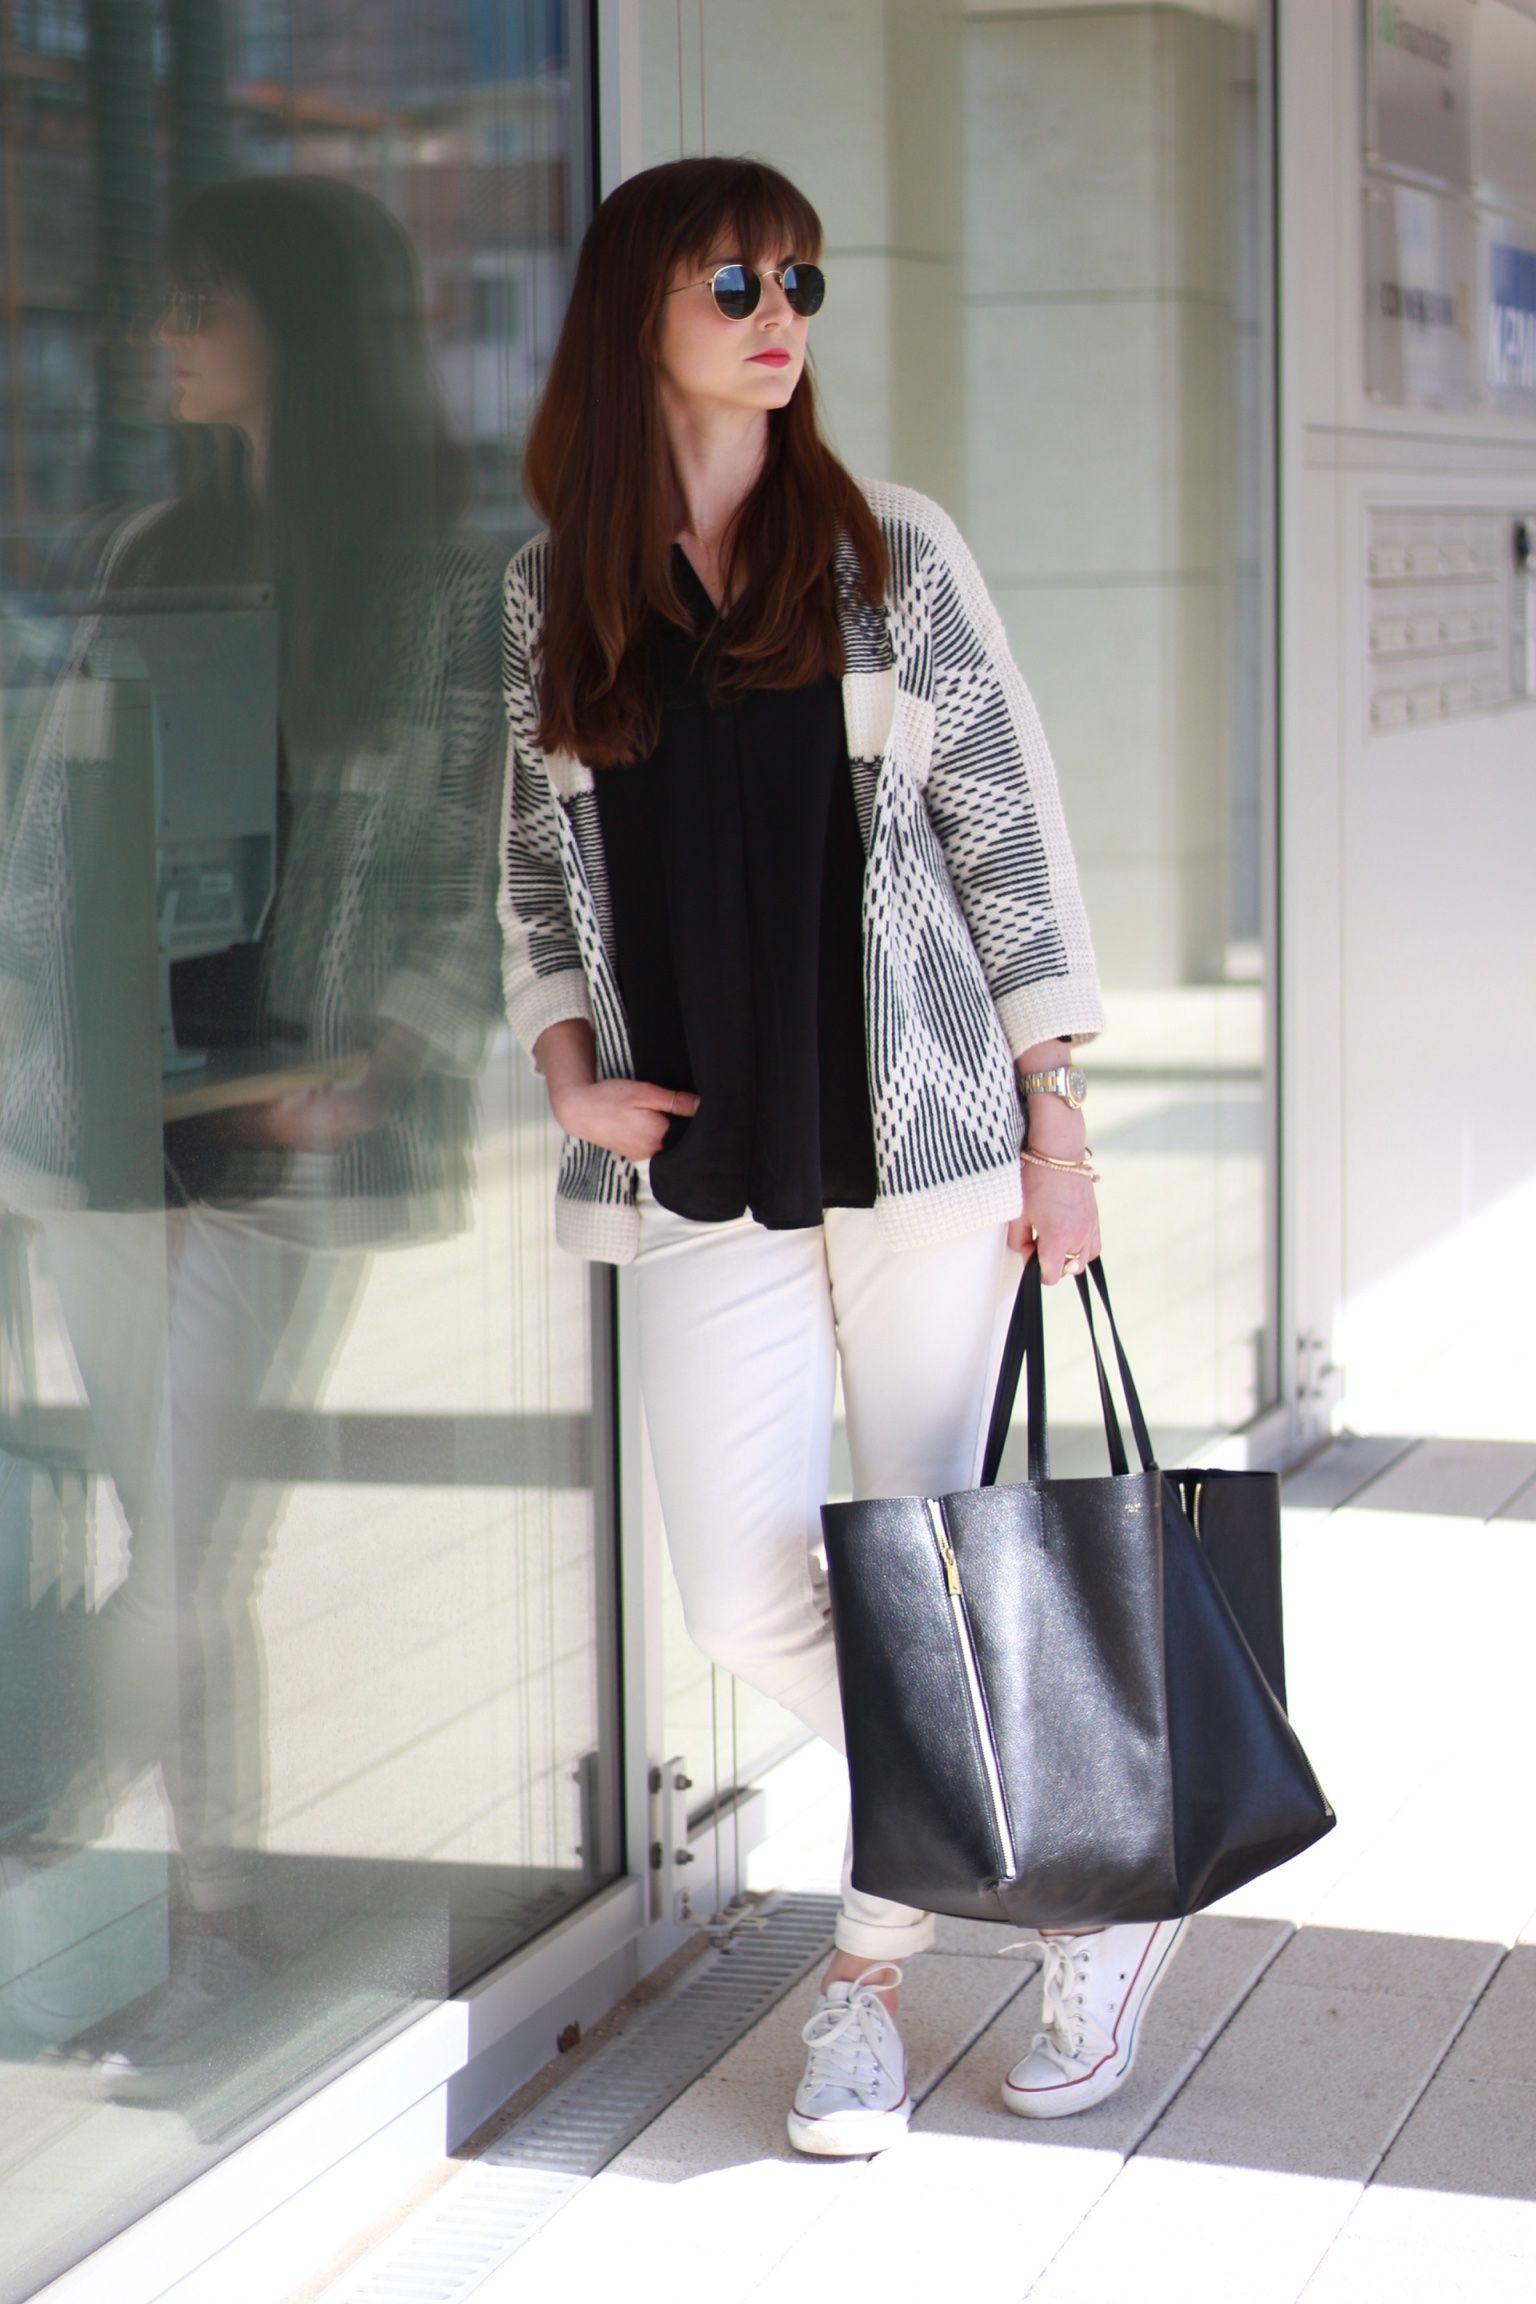 Selfnation-Maßjeans-maßgeschneidert-Jeans-Outfit-Fashion-Blog